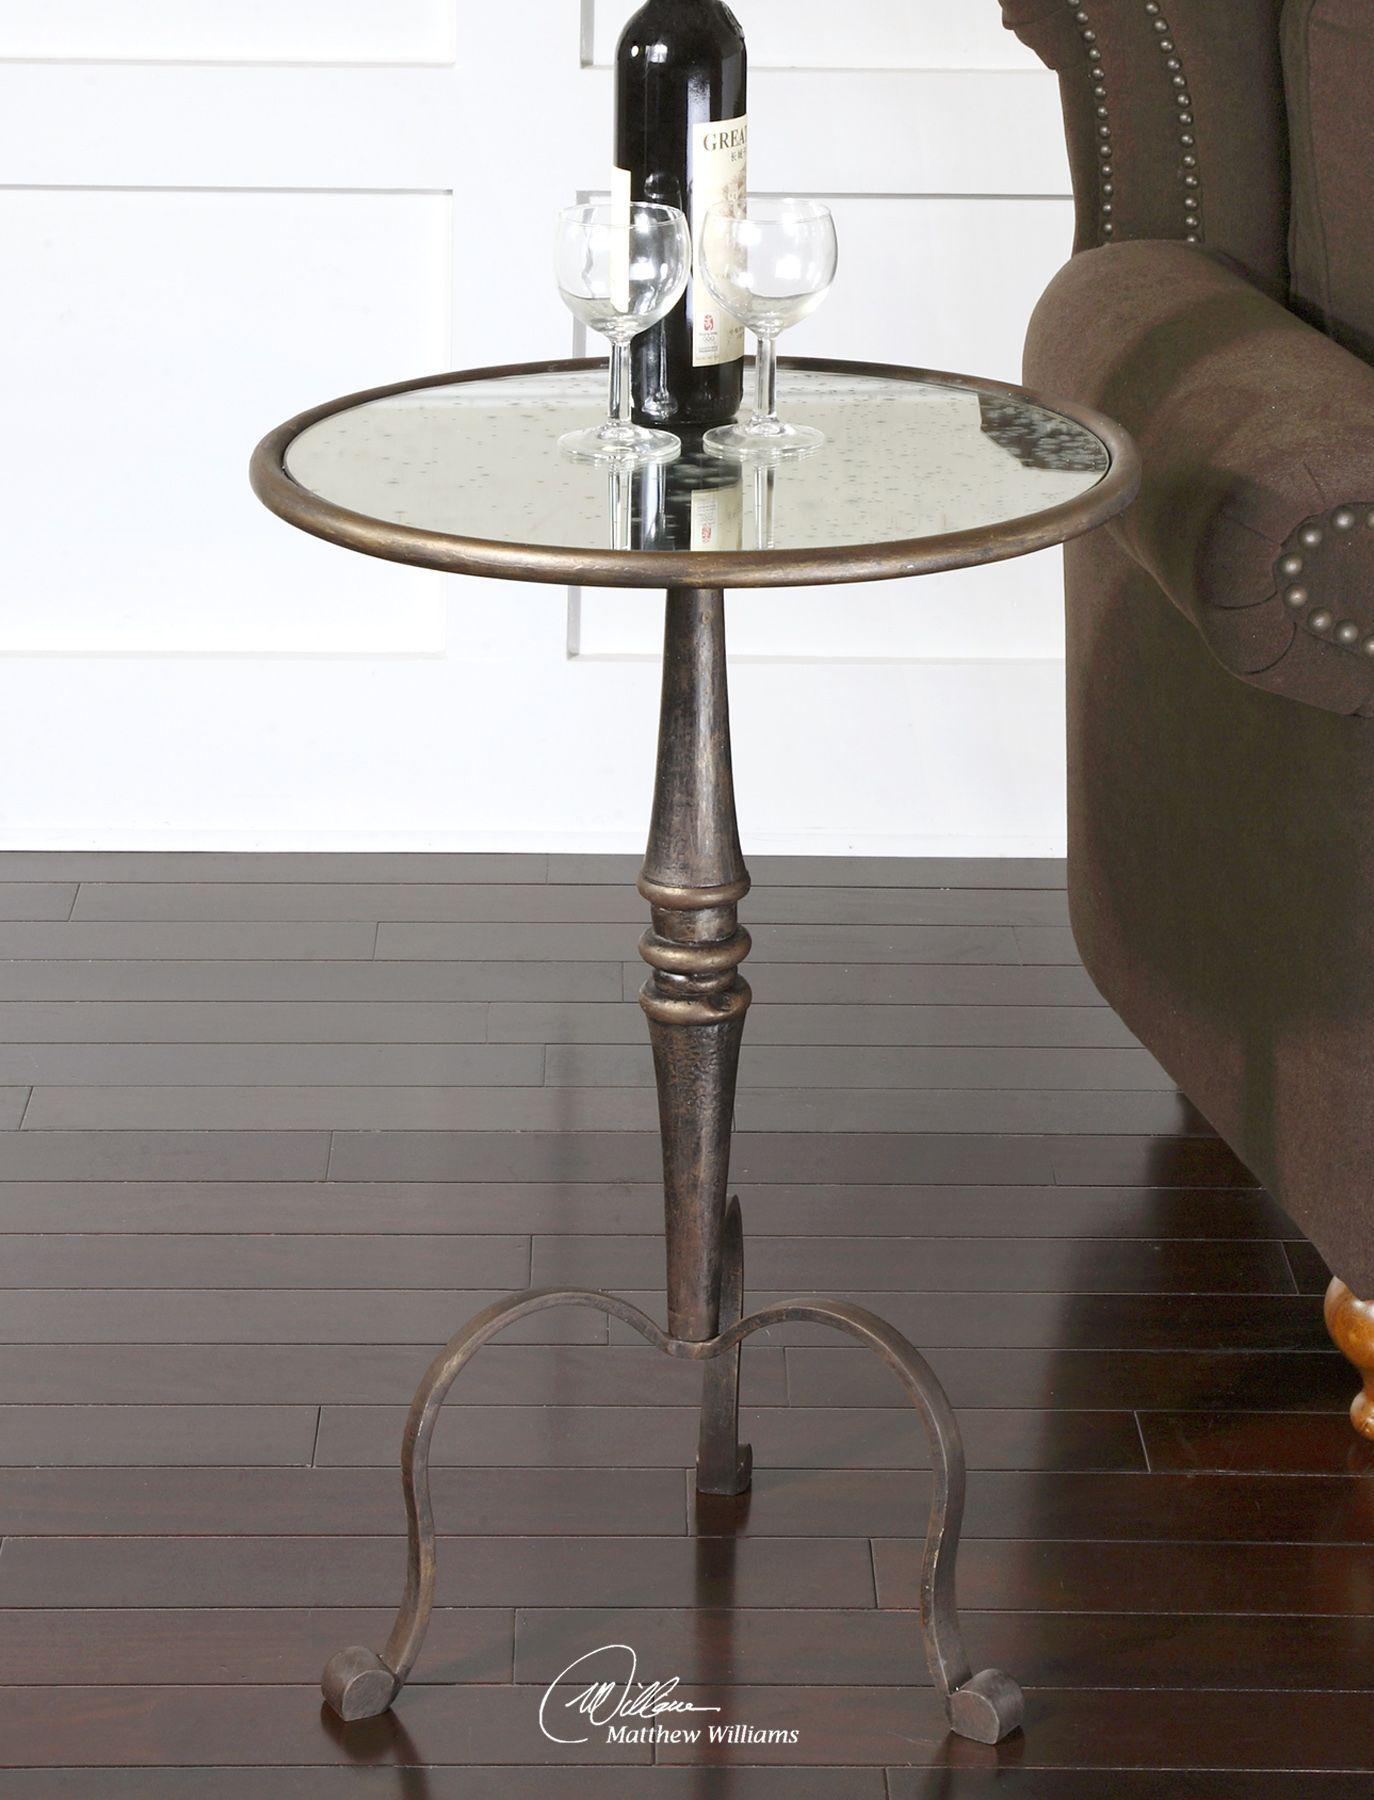 ... Mirrored Accent Table In Coffee Bronze. U2039 U203a